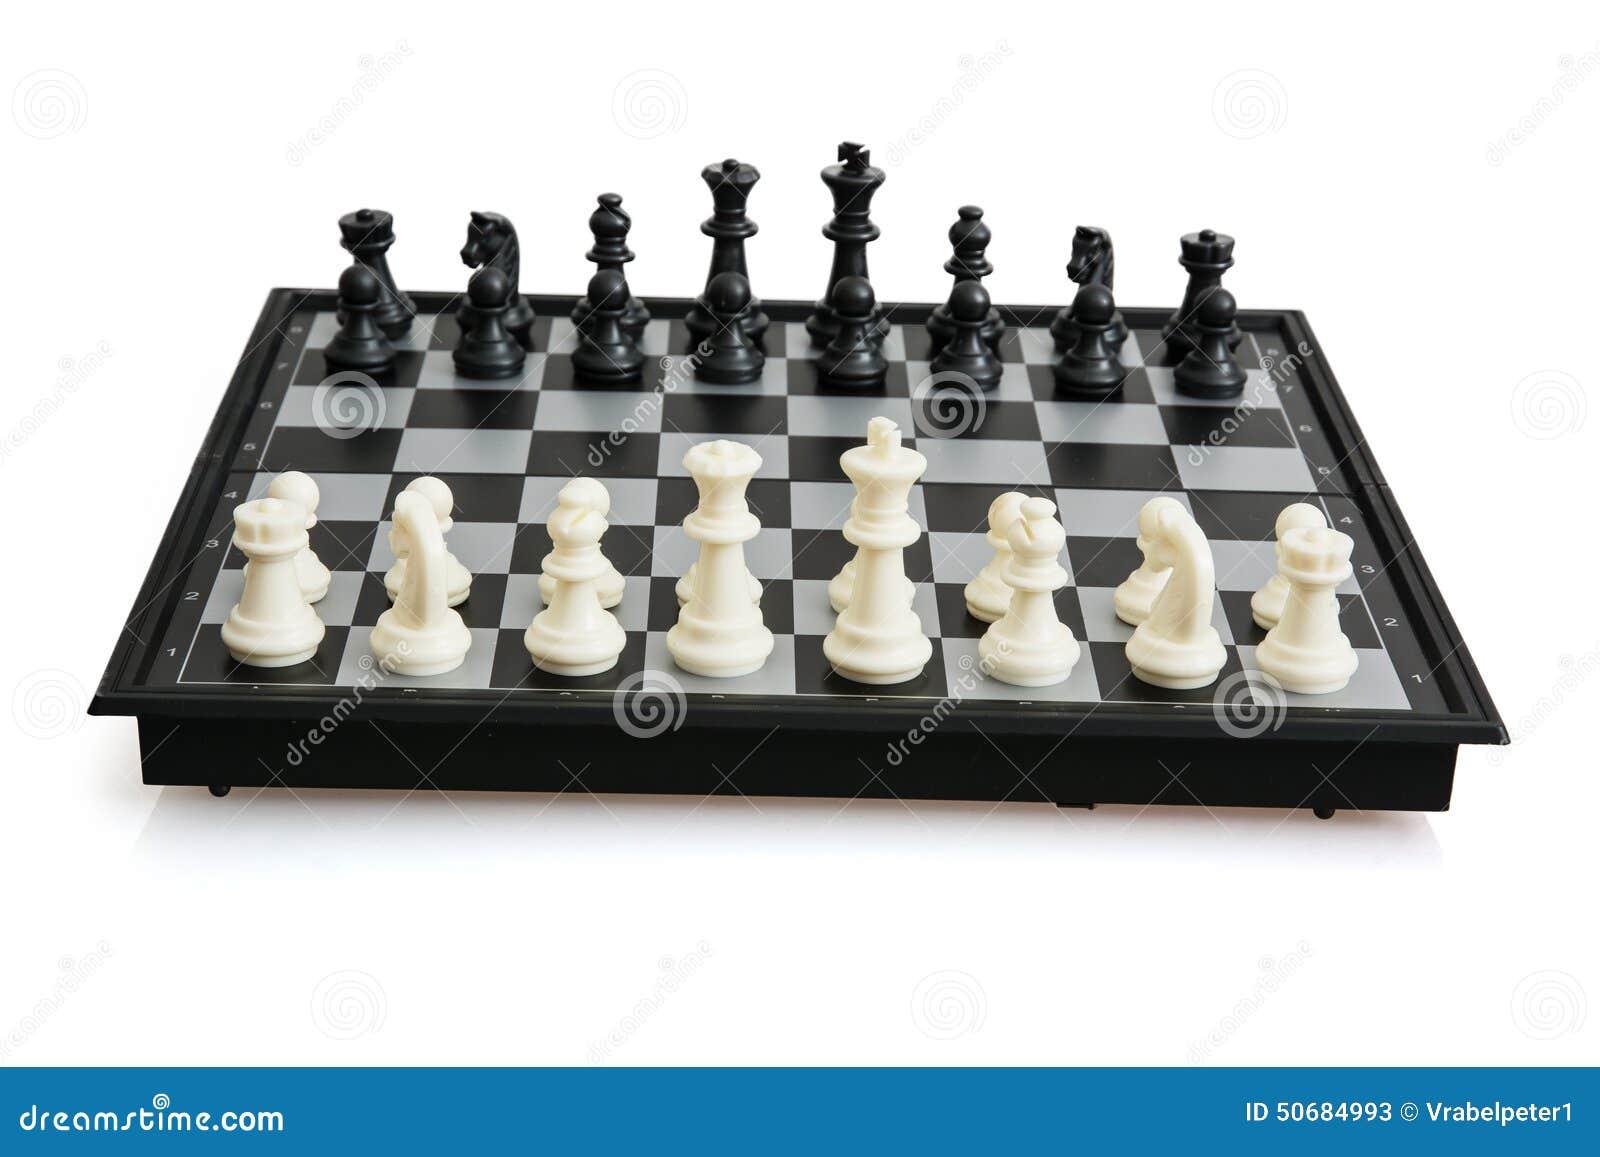 Download 棋 库存图片. 图片 包括有 小雕象, 查出, 嬉戏, 概念, 竞争, 人兽交, 招待, 比赛, 没人, 会议室 - 50684993